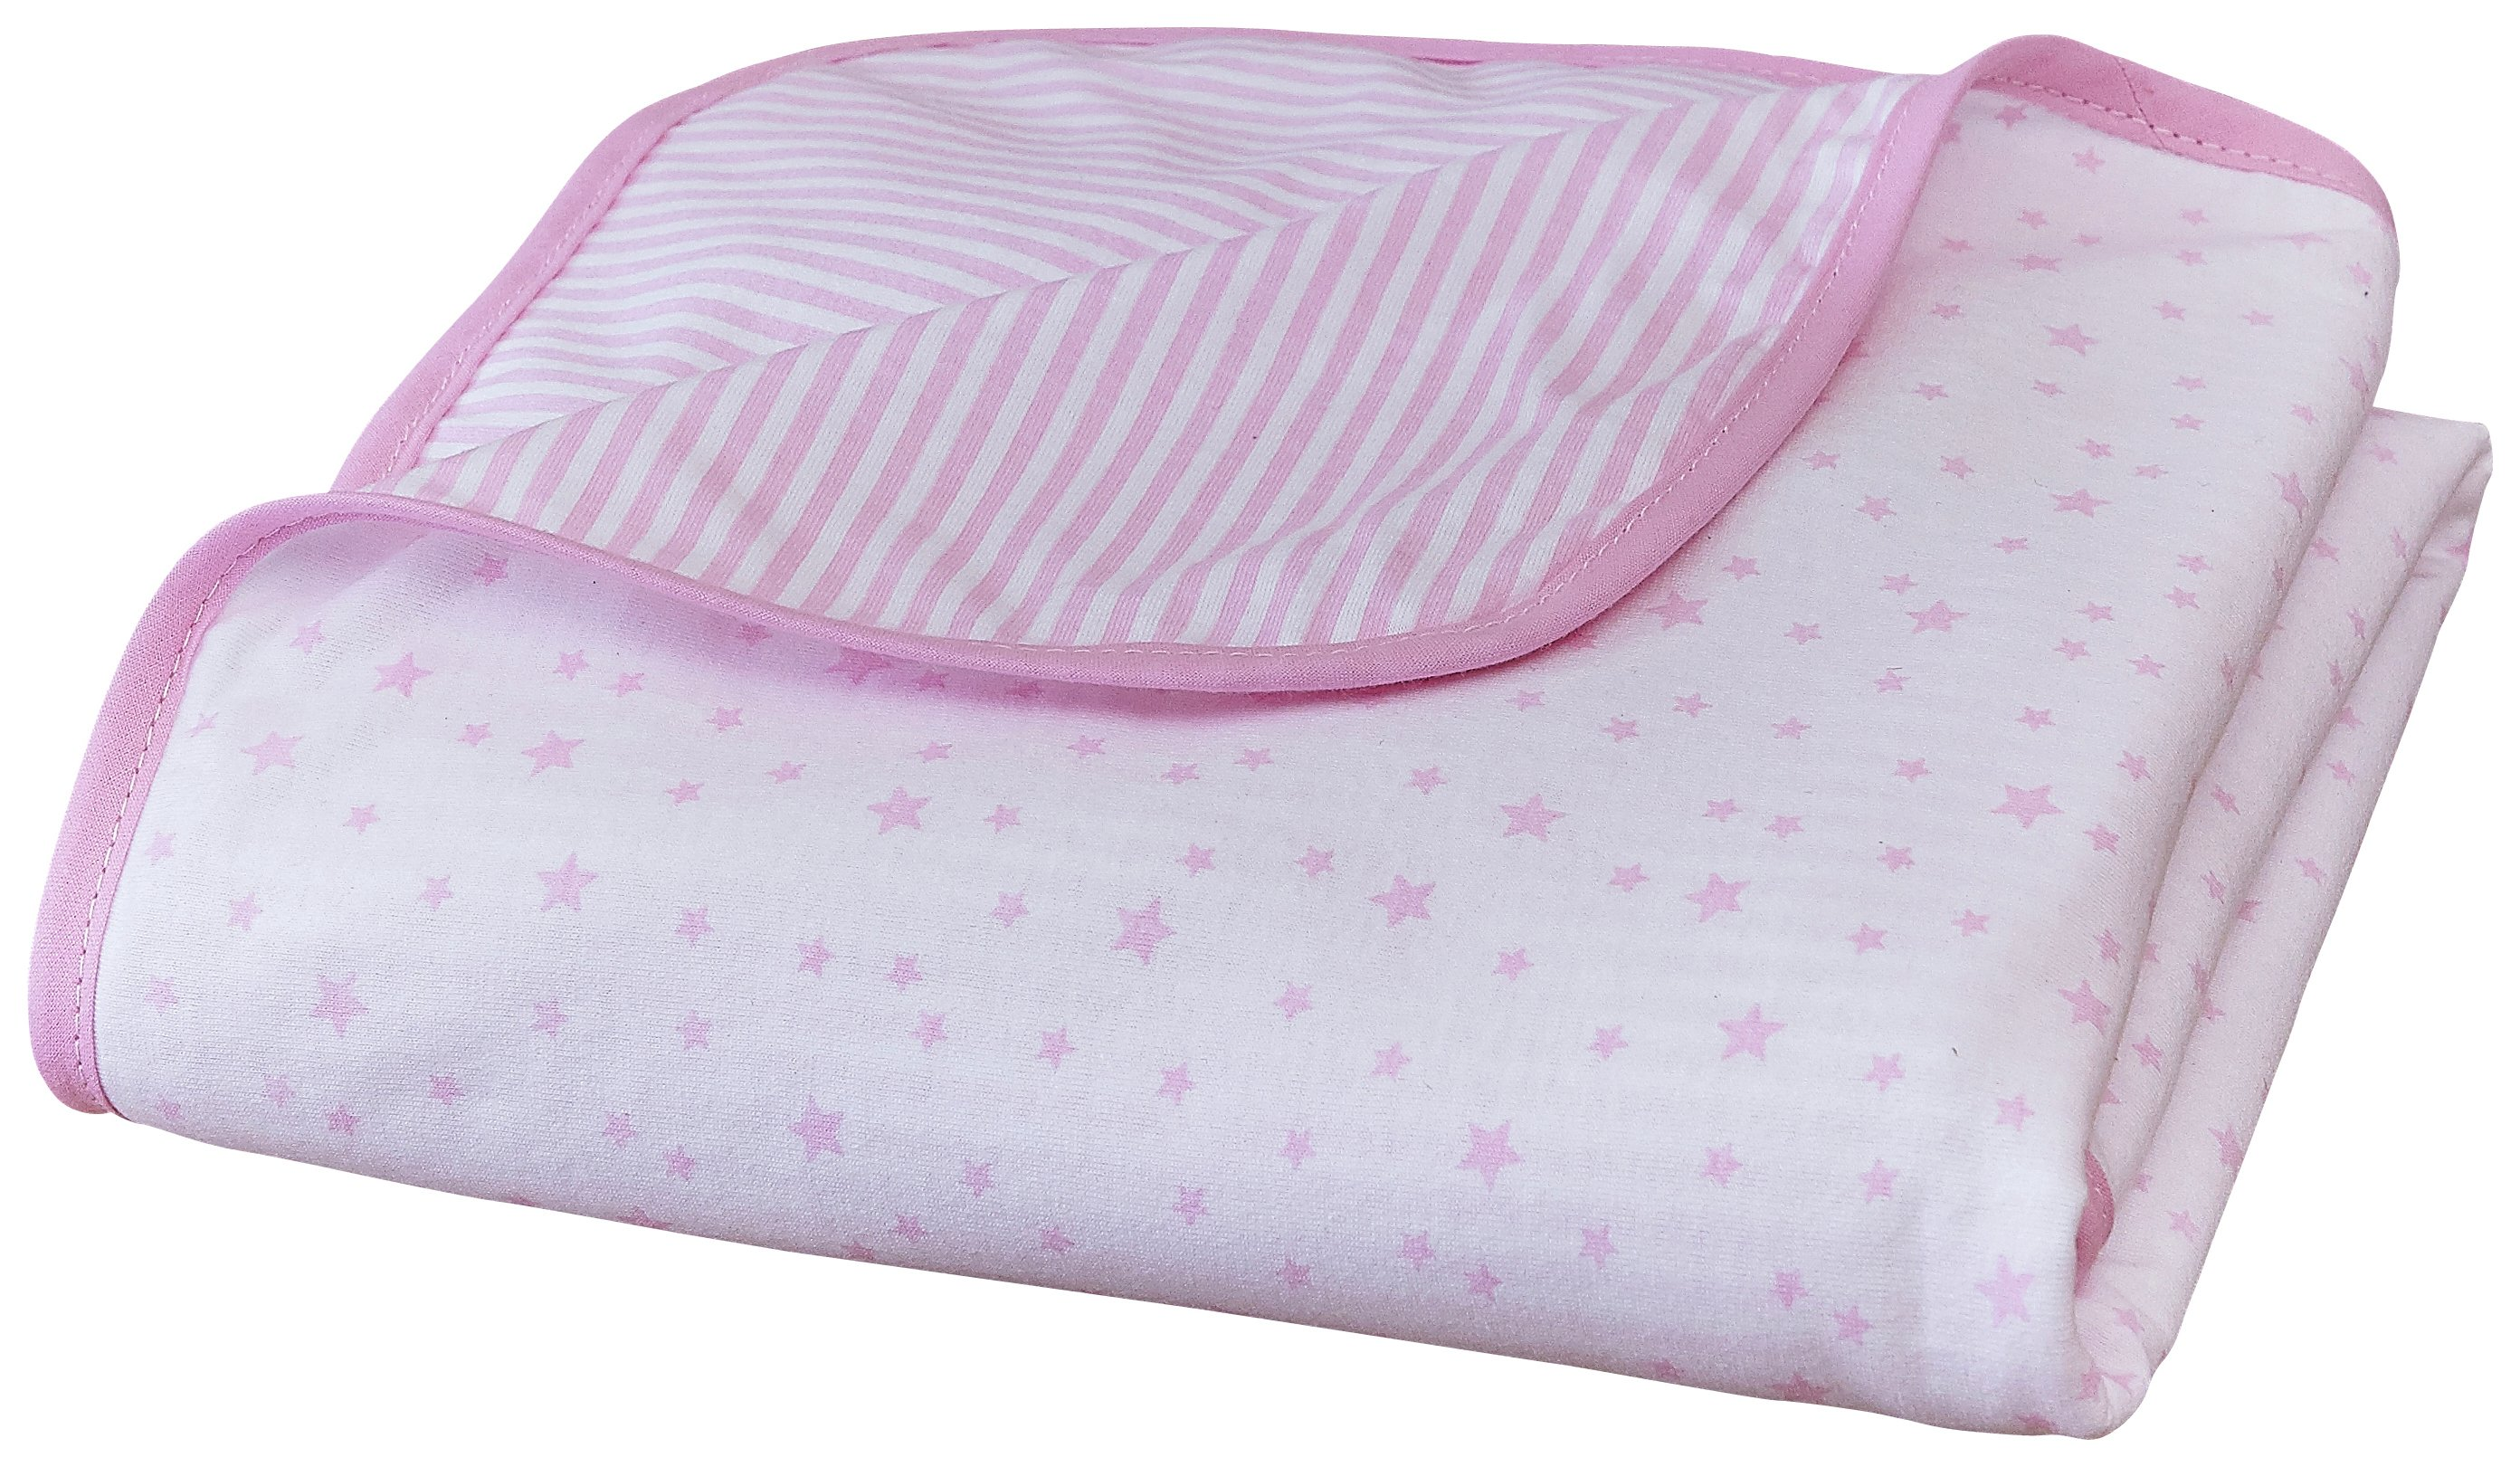 Clair De Lune Stars & Stripes Pram Blanket - Pink